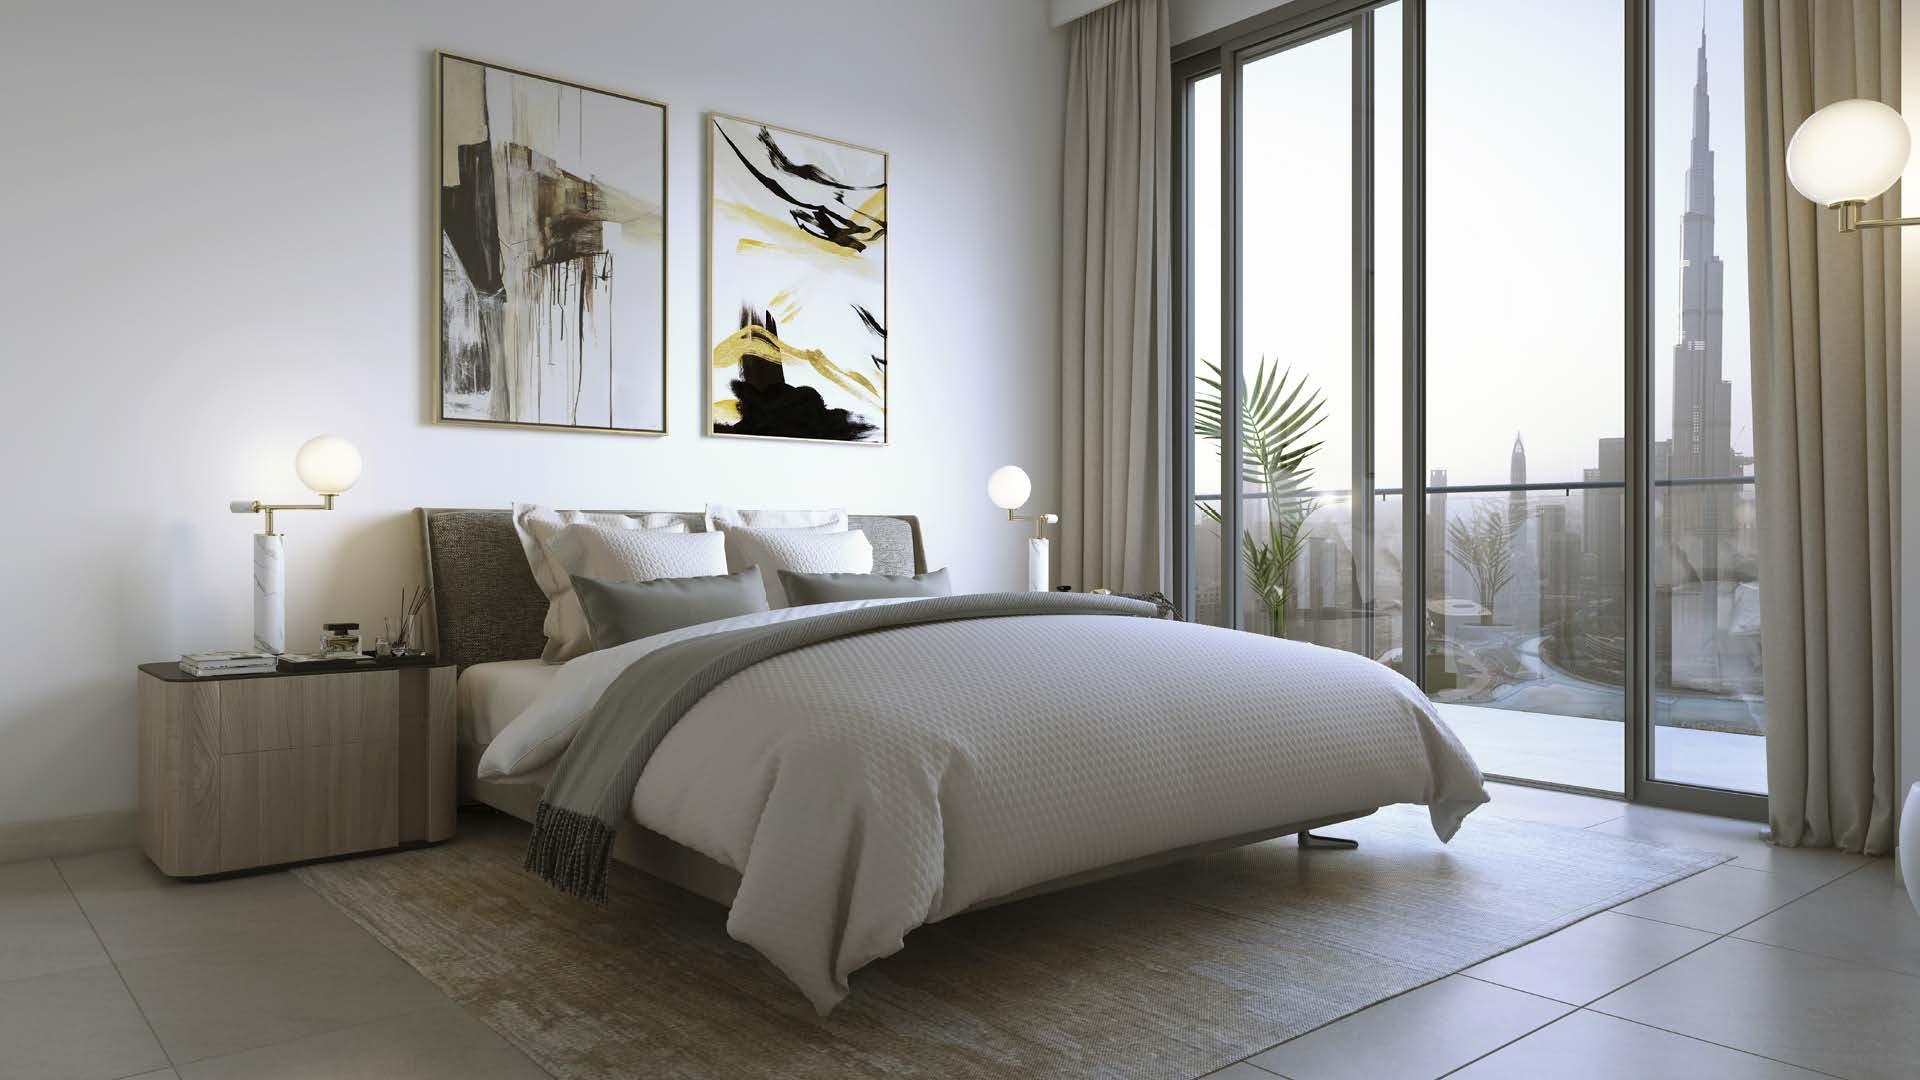 Burj Royale by Emaar in Downtown Dubai. Luxury apartments for sale in Dubai